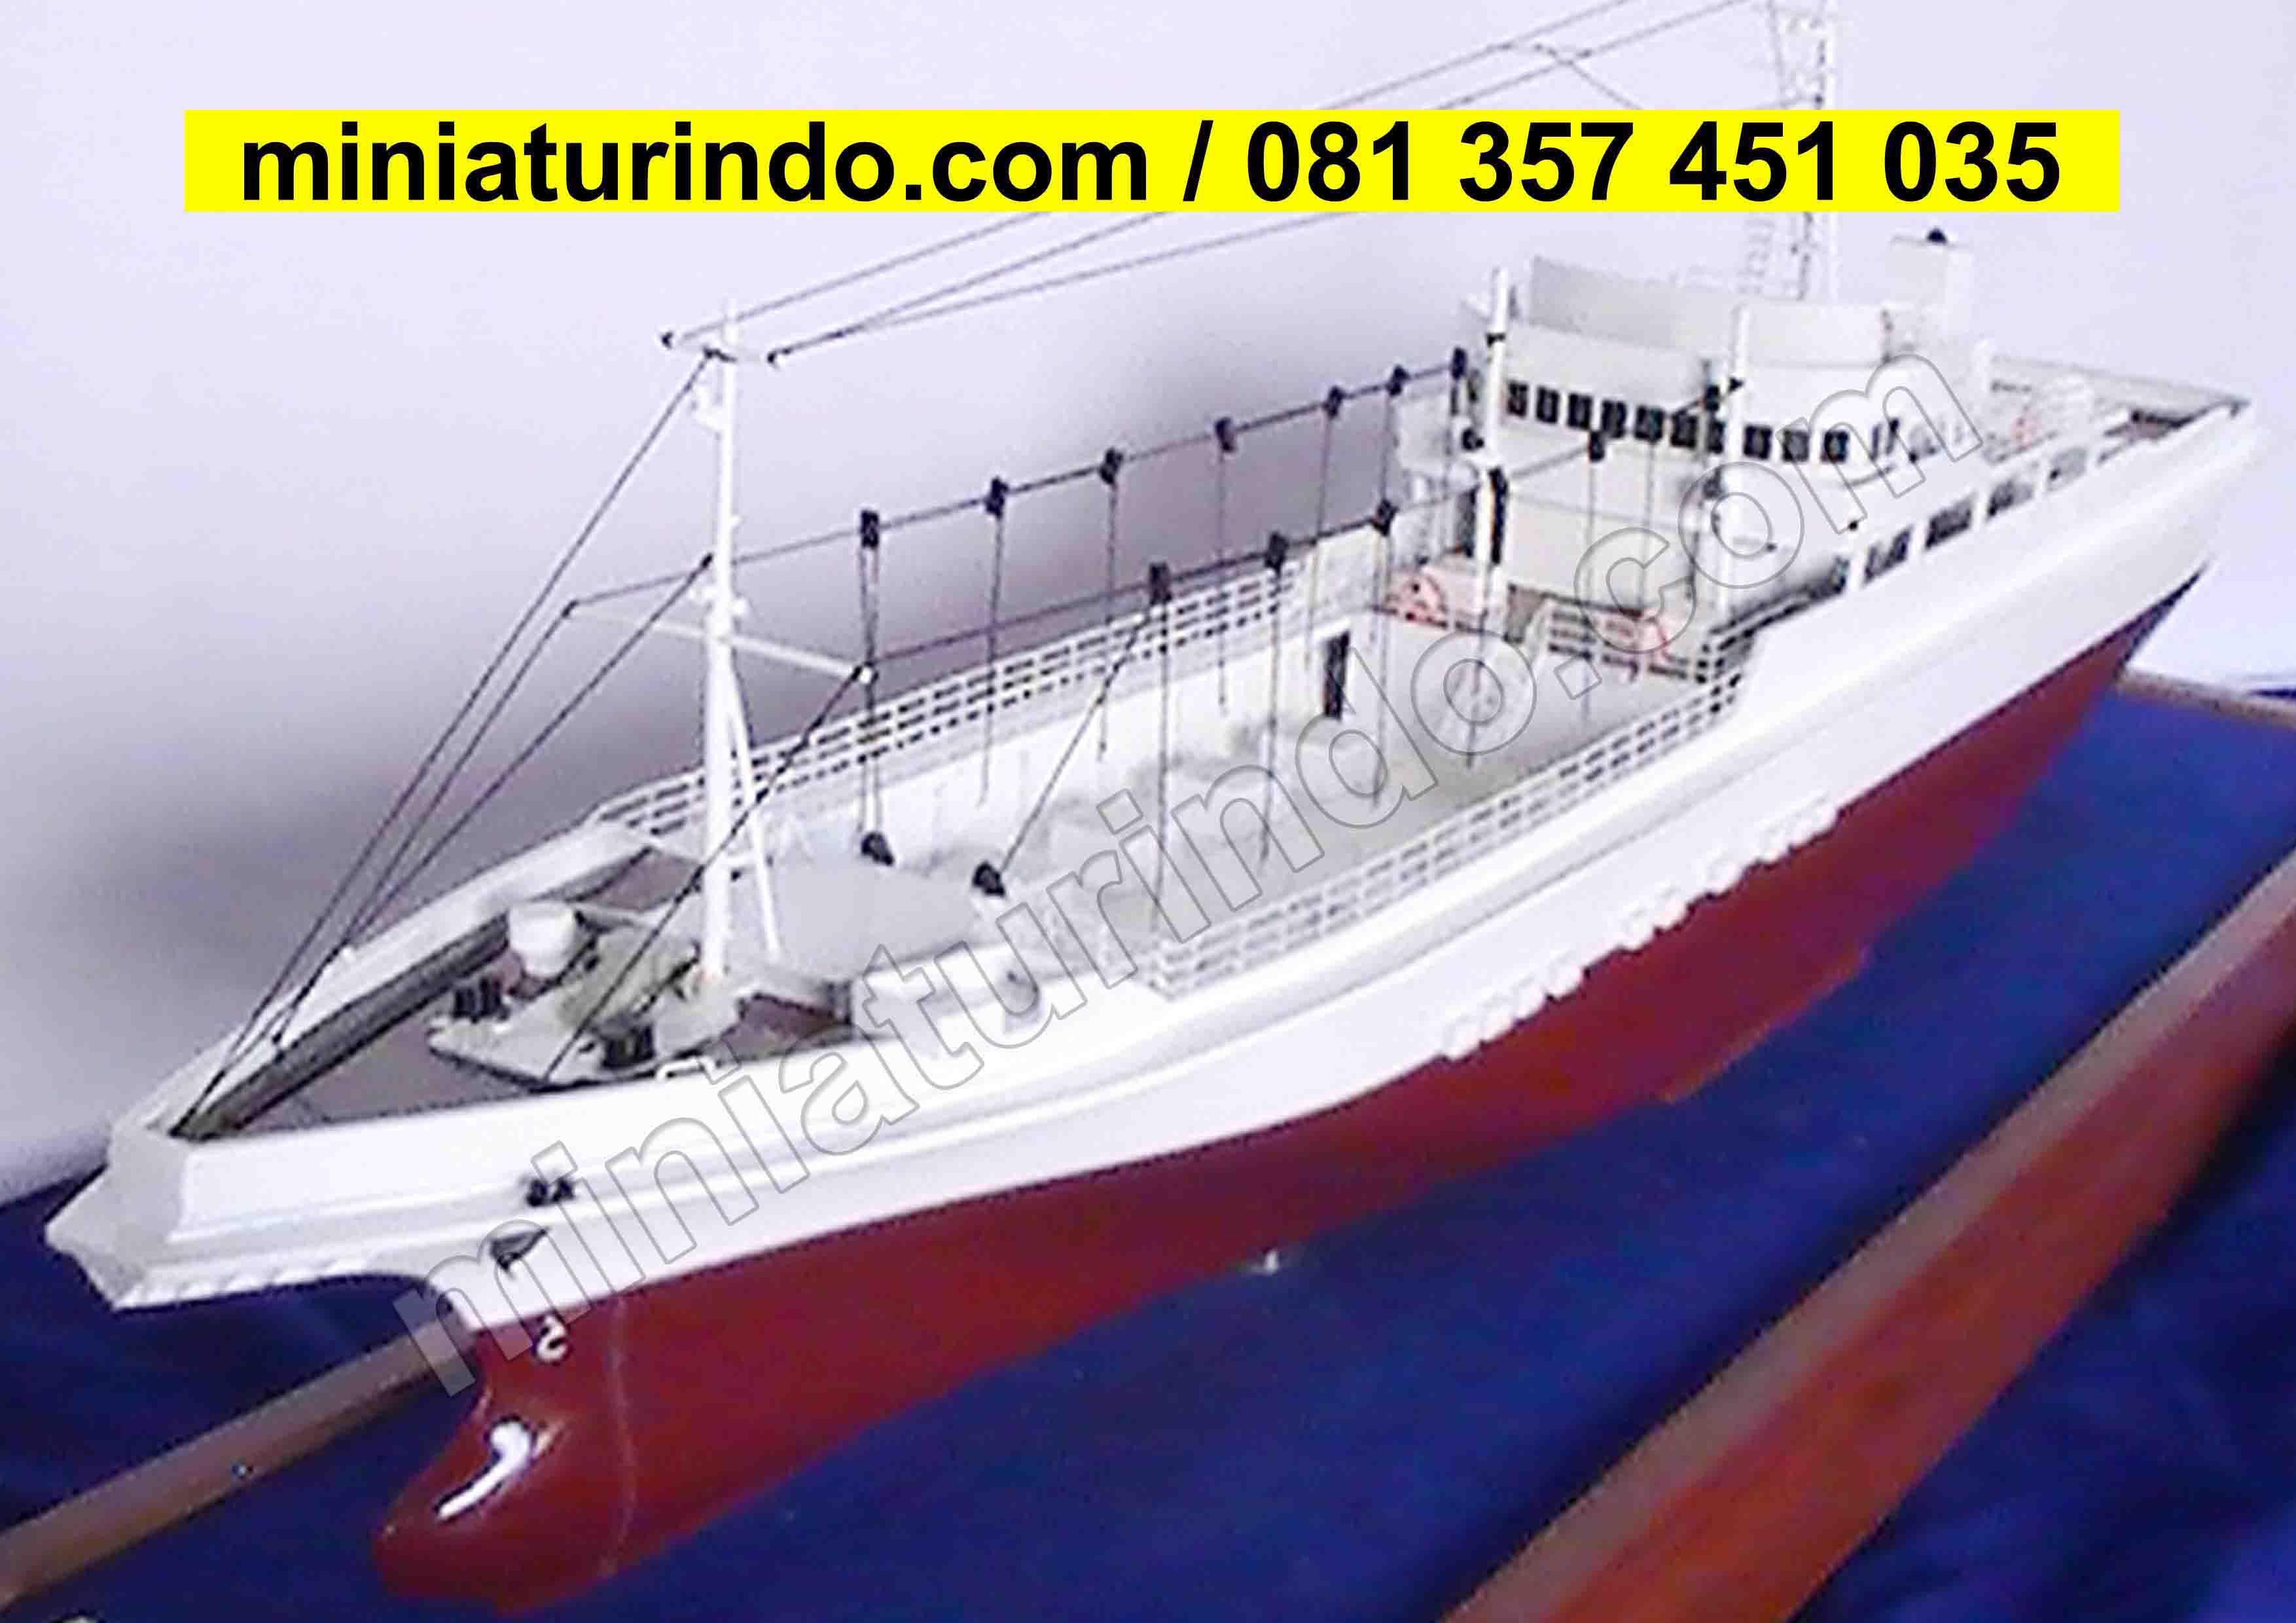 Cara Membuat Miniatur Kapal Perang Cara Membuat Perahu Mainan Dari